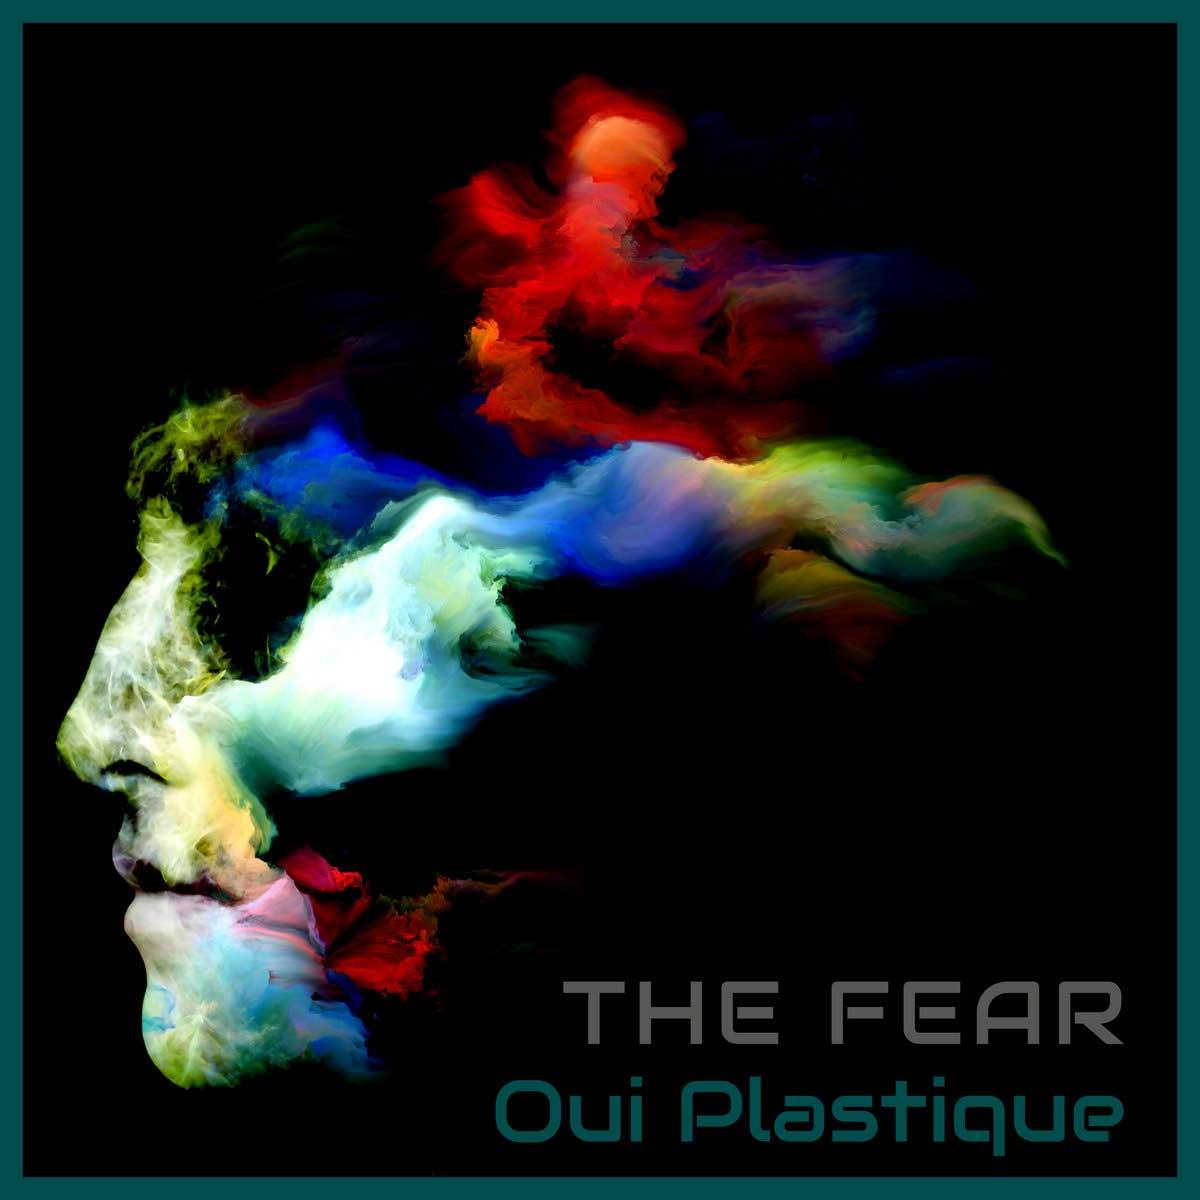 Oui Plastique - The Fear - Oui Plastique - The Fear